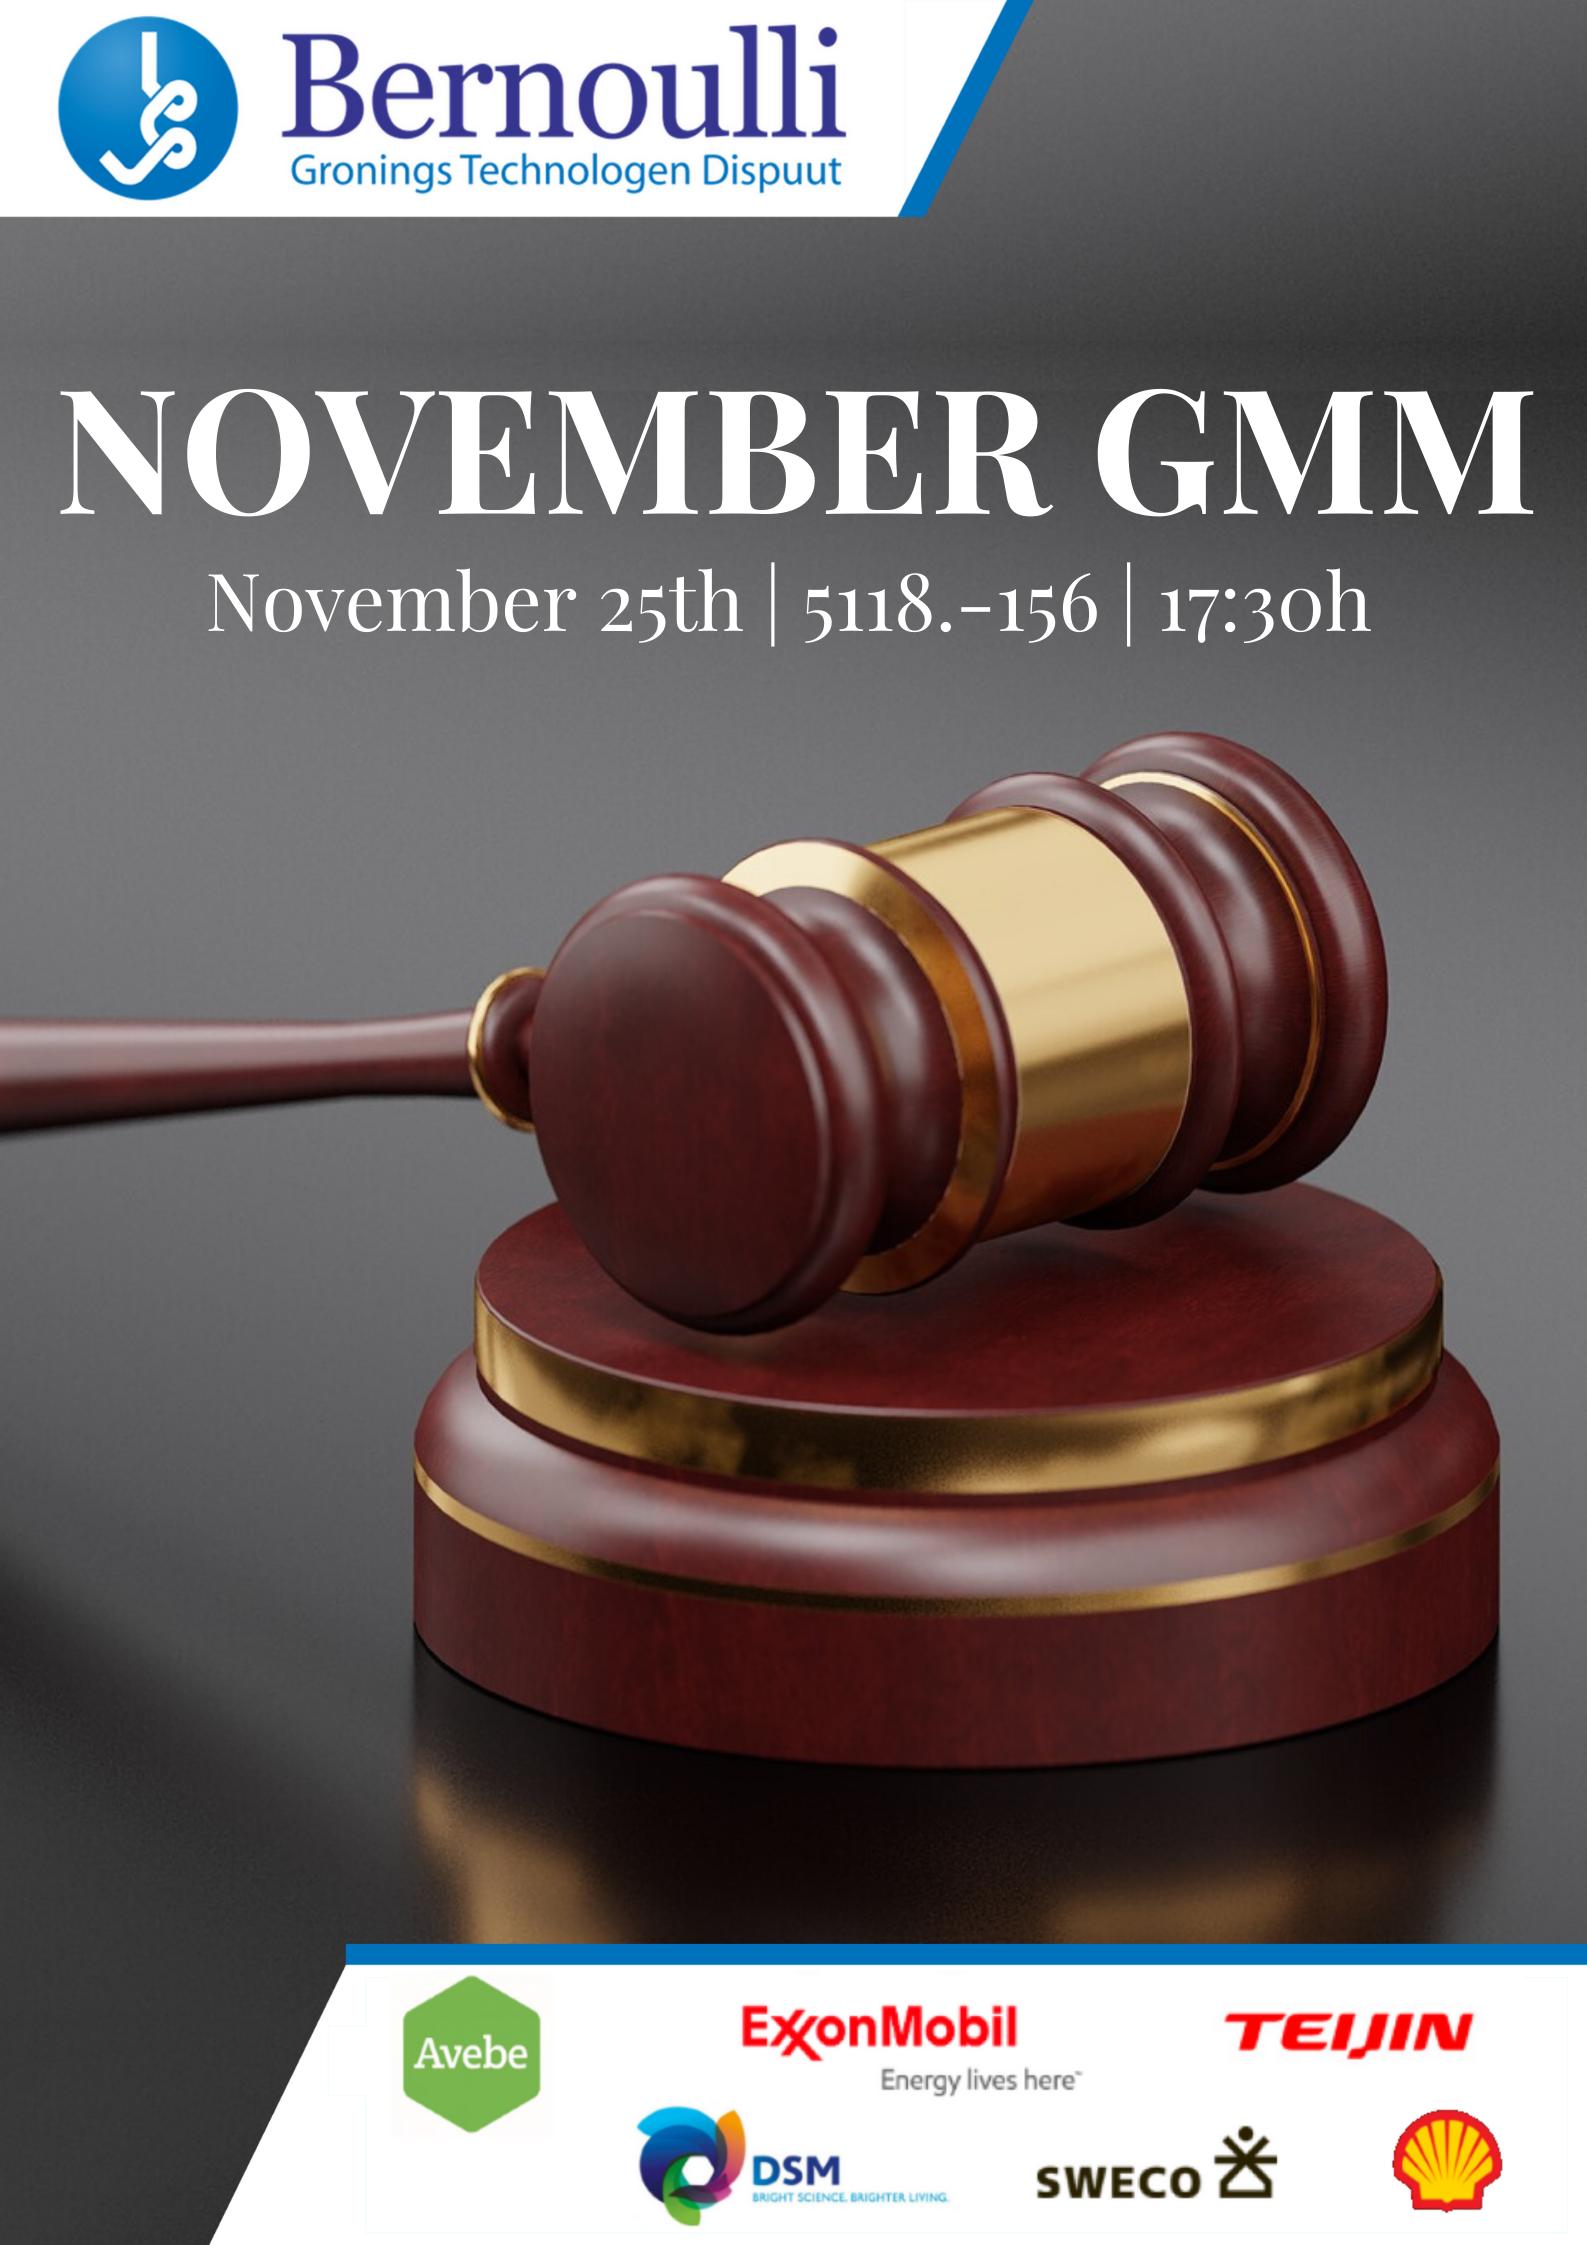 November GMM